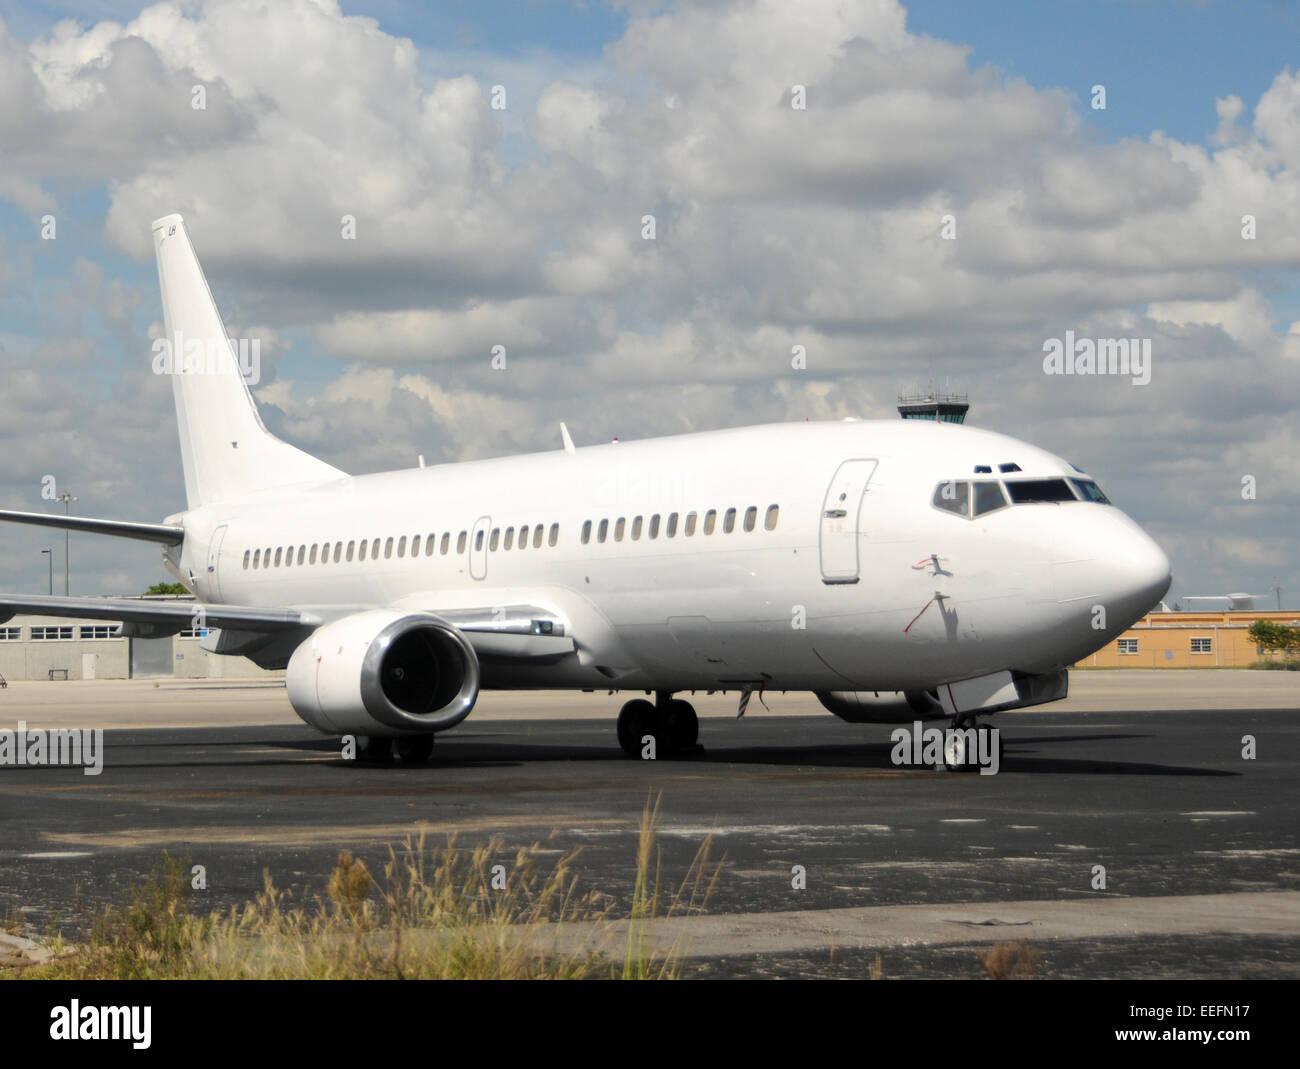 Modernen Passagierjet in unmarkierten Weißlack Boeing 737 Flugzeug Stockbild